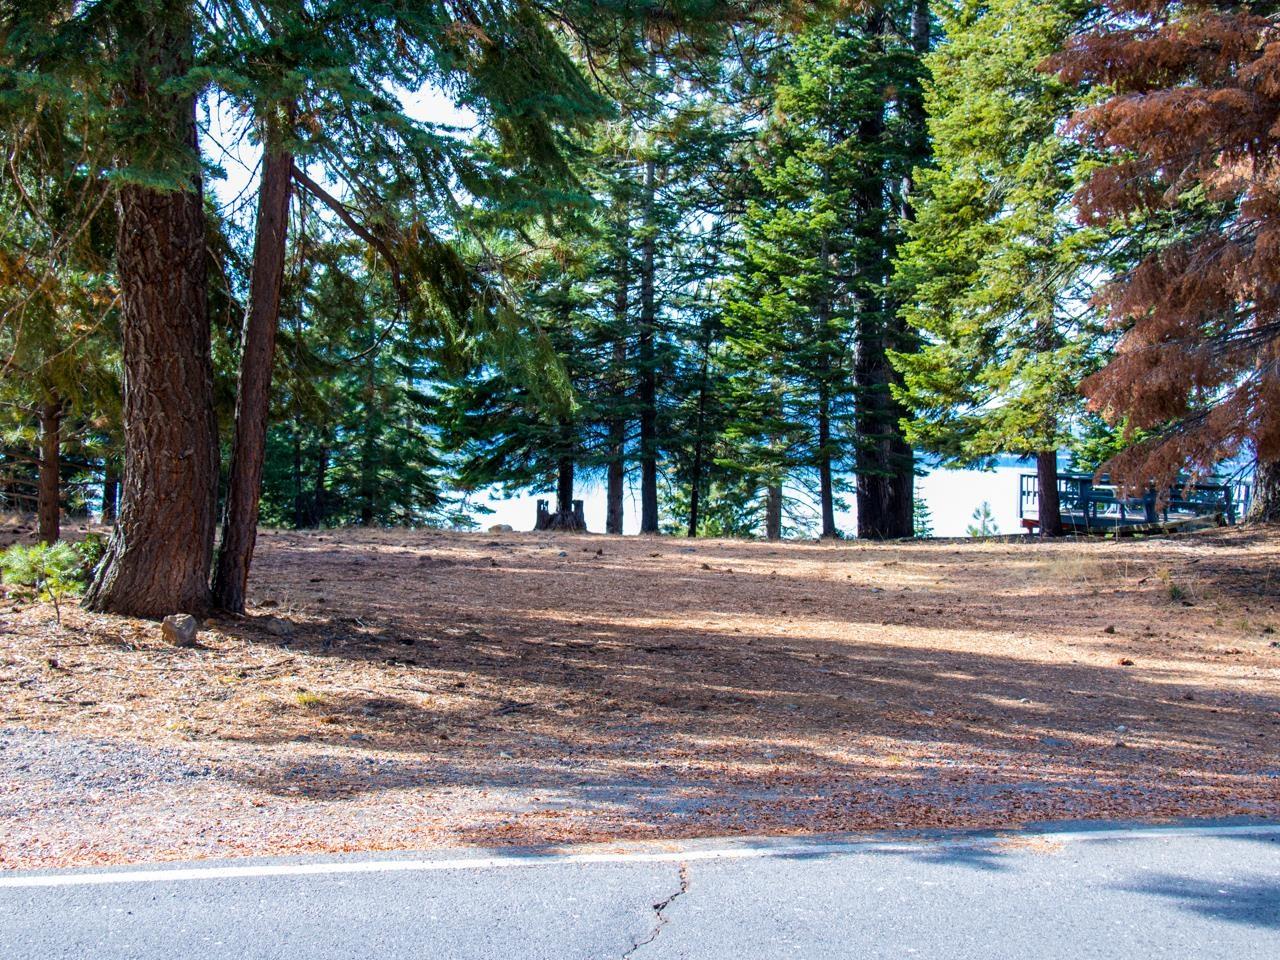 945 Lassen View Drive, Lake Almanor, CA 96137